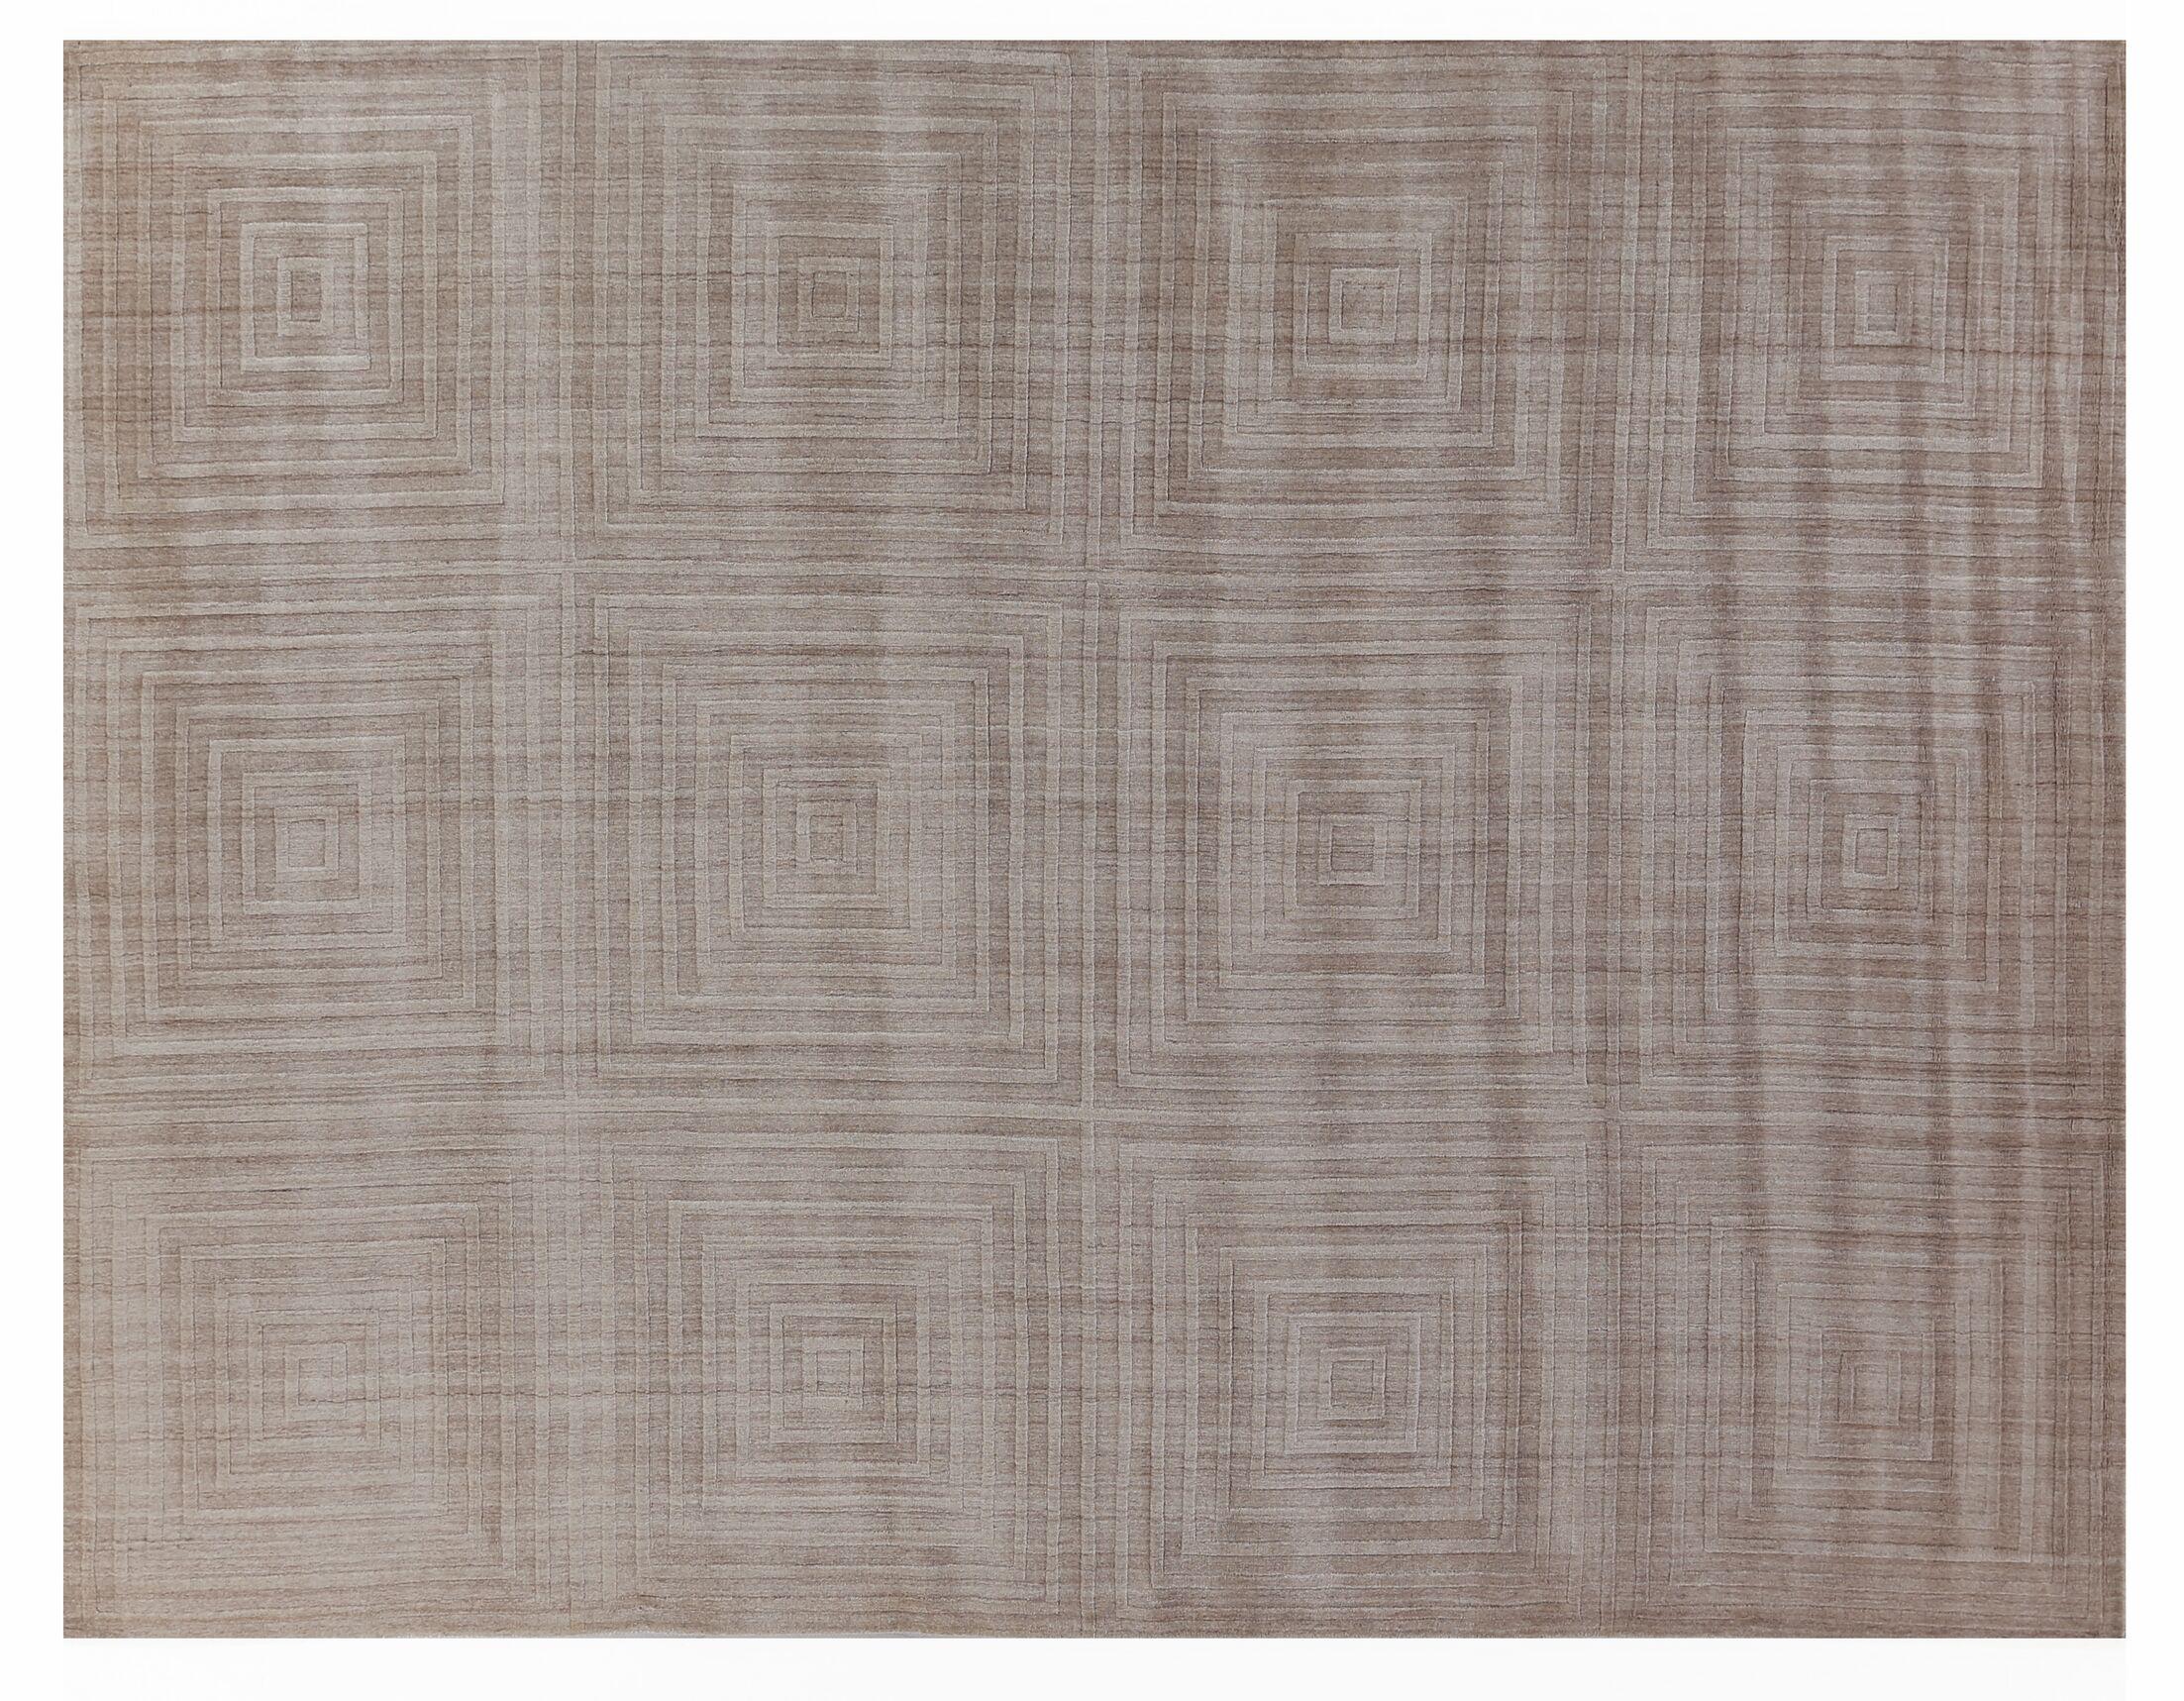 Robin Hand-Loomed Wool/Silk Beige Area Rug Rug Size: Rectangle9' x 12'